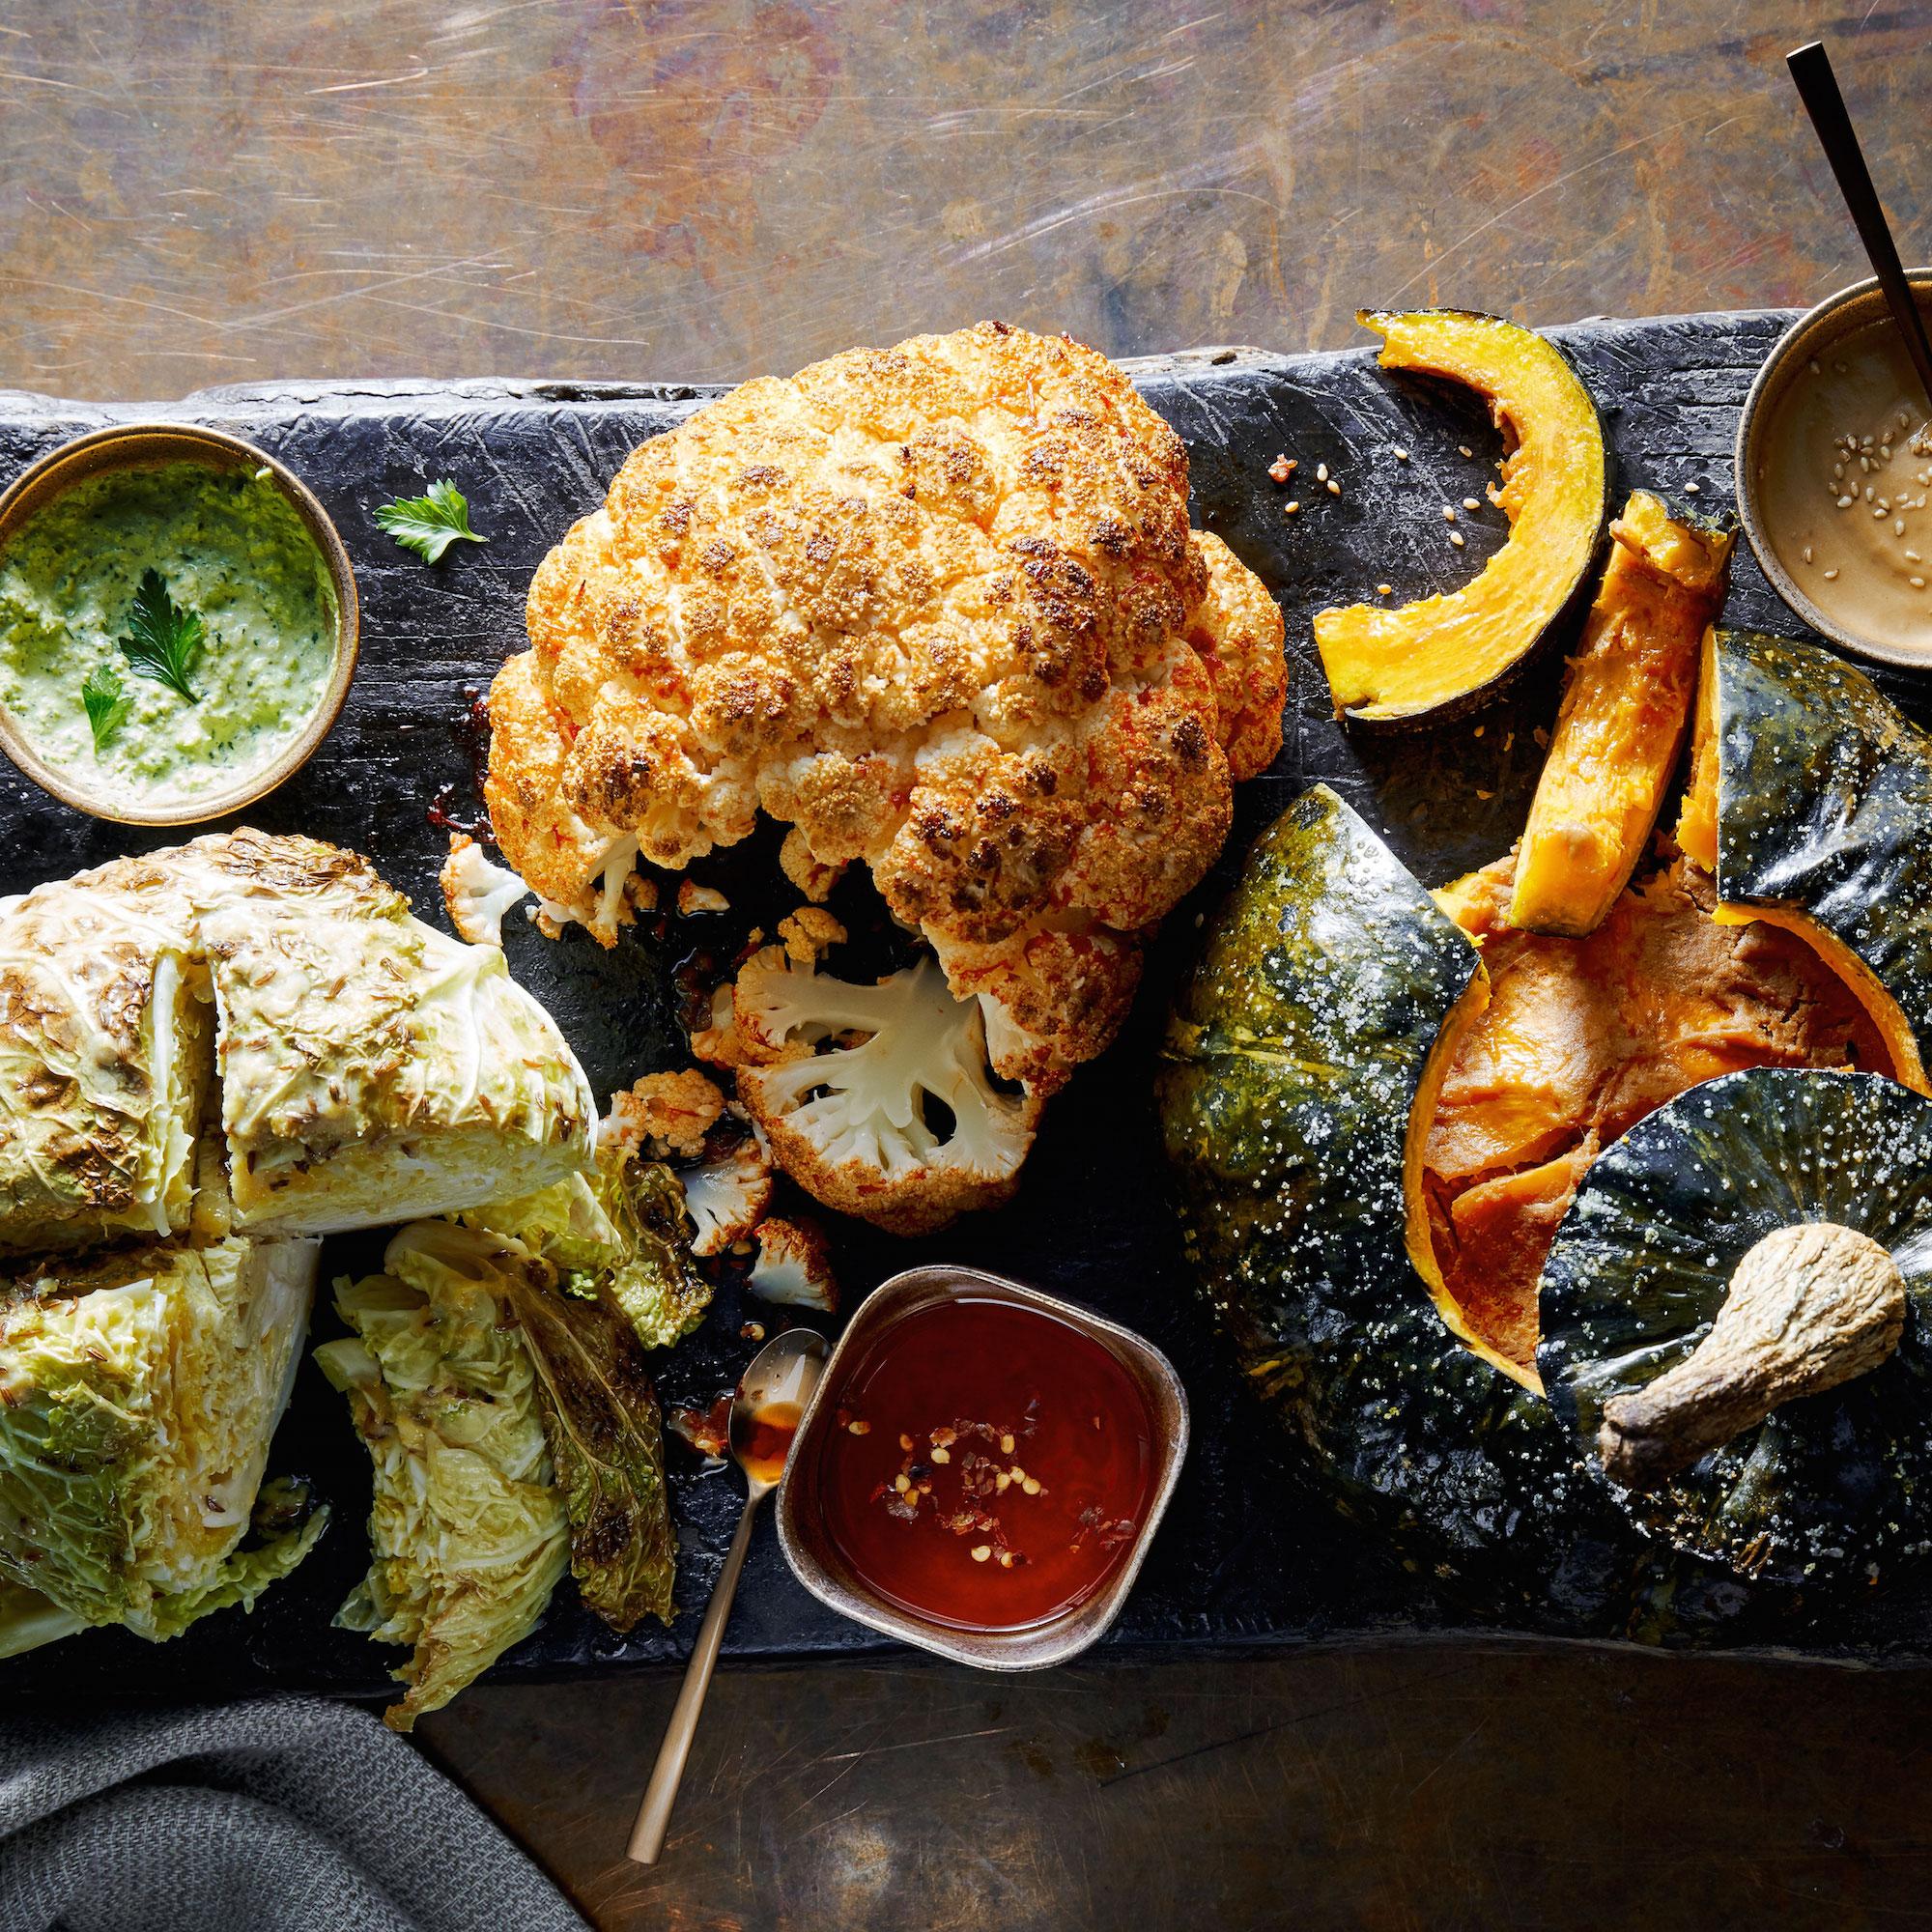 su-Platter of Roasted Whole Vegetables Image